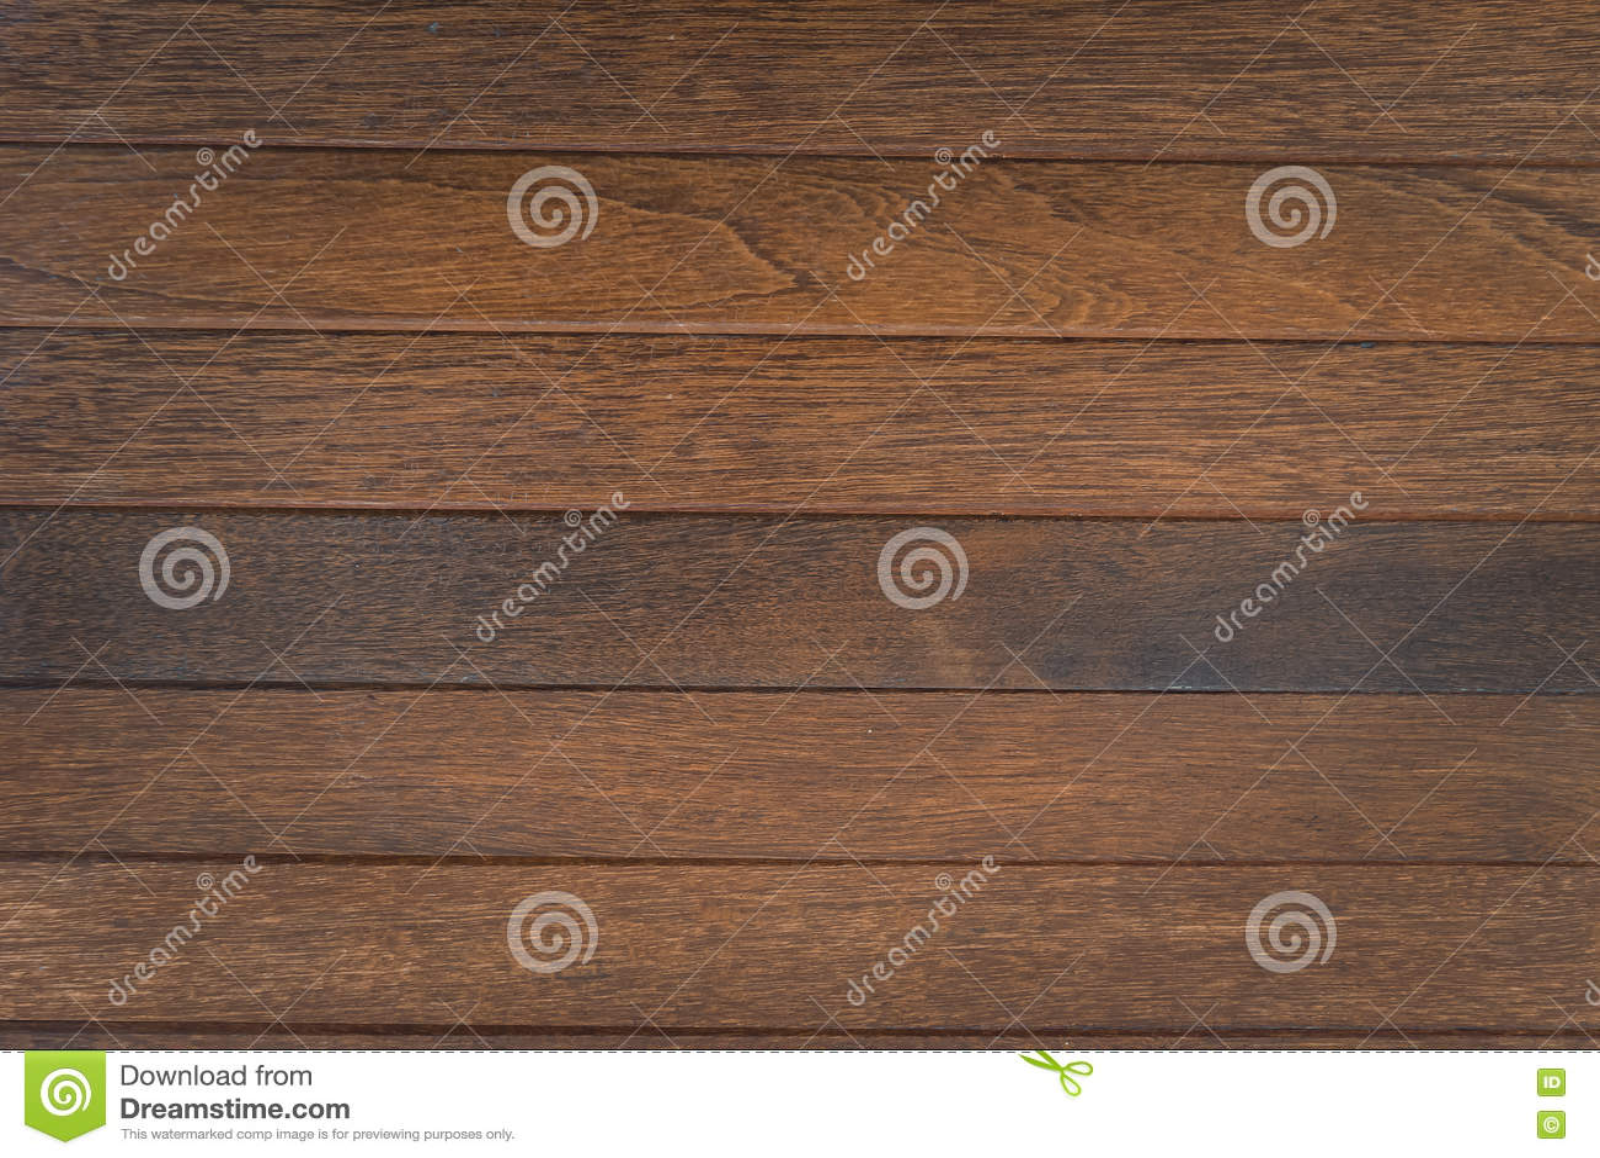 Древесина темного коричневого цвета